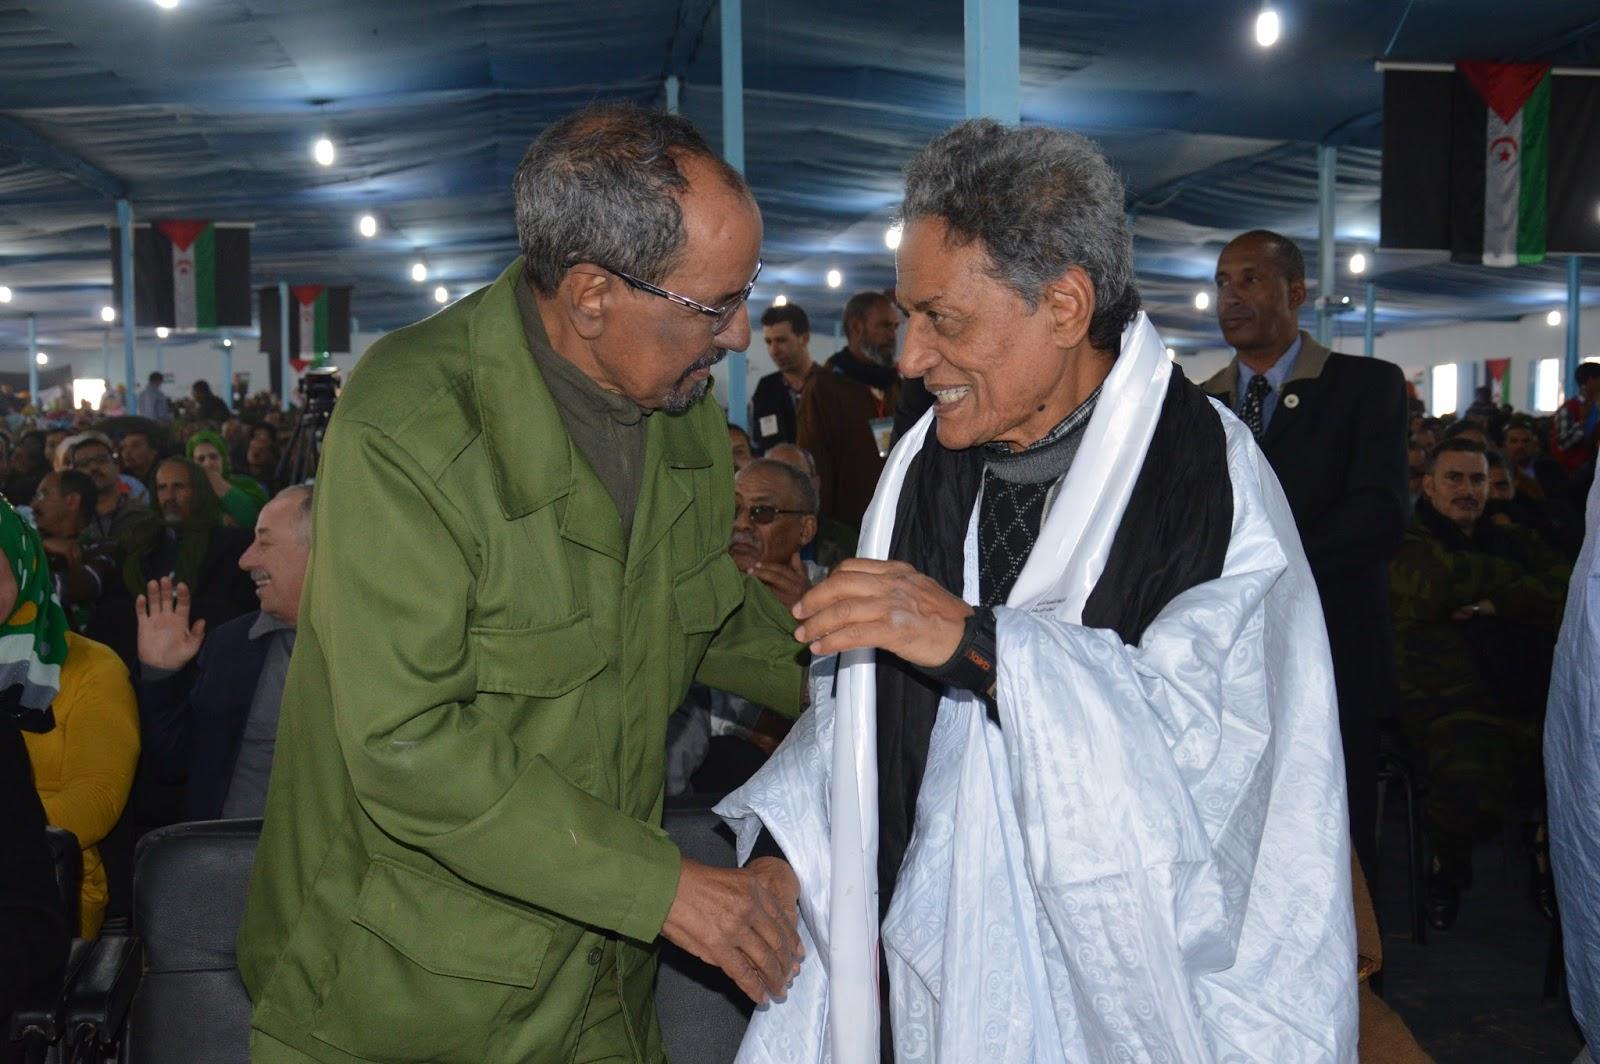 Ahmed Baba Meska avec l'ancien secrétaire général du Polisario Mohamed Abdelaziz. / Ph. DR